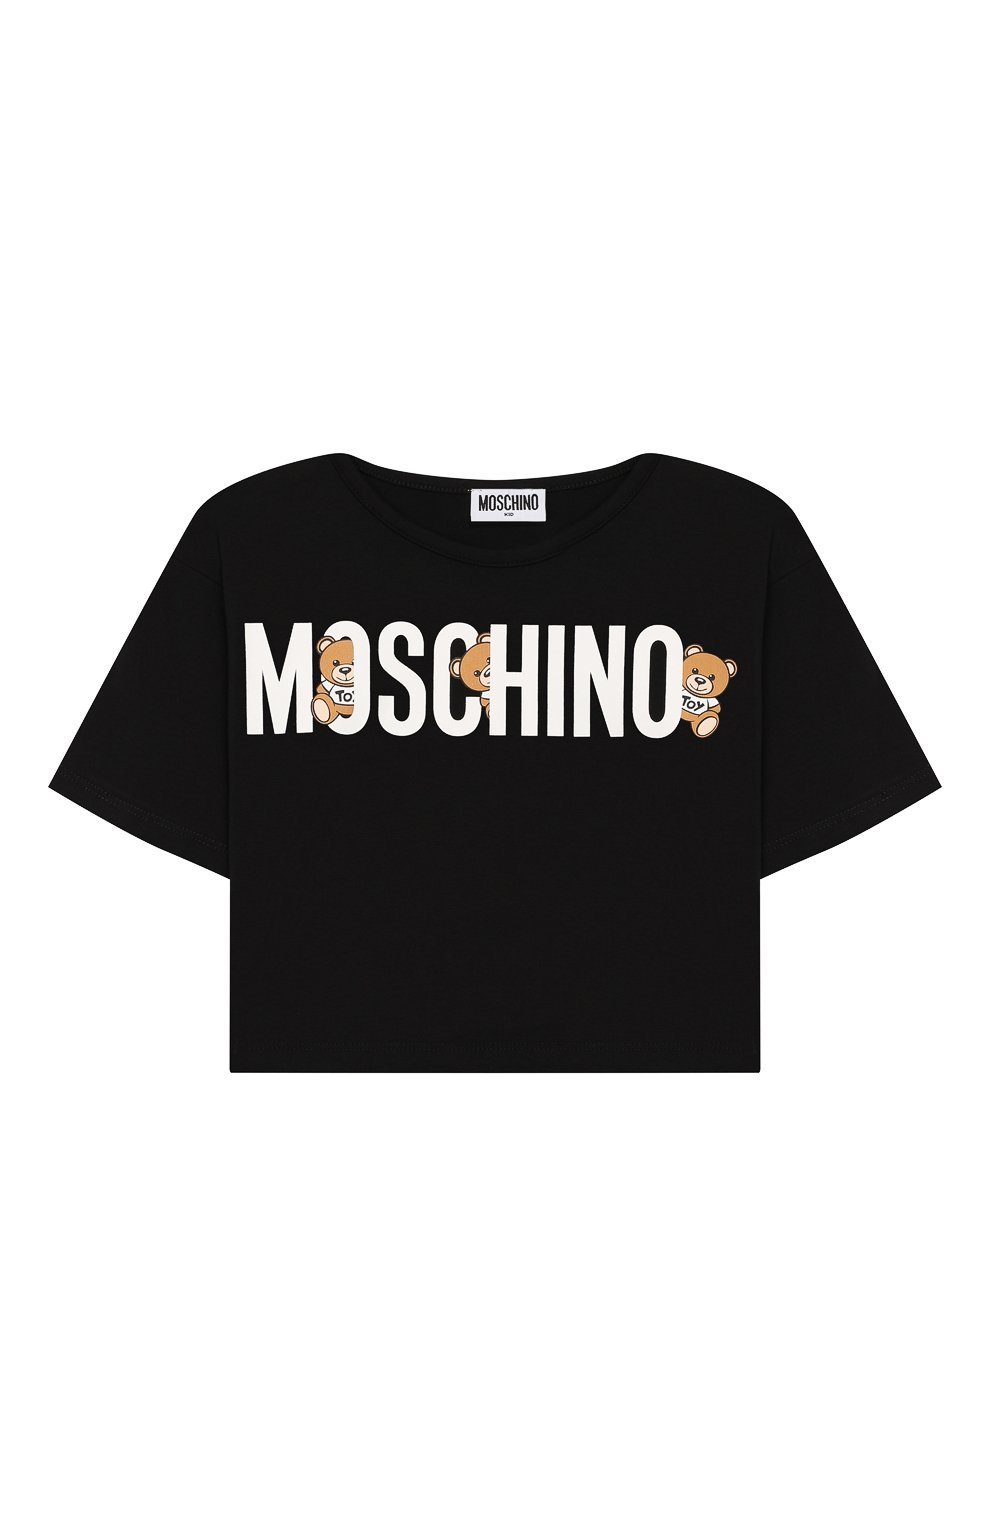 Детский комплект из футболки и юбки MOSCHINO KID разноцветного цвета, арт. HDG001/LDB39/4A-8A | Фото 2